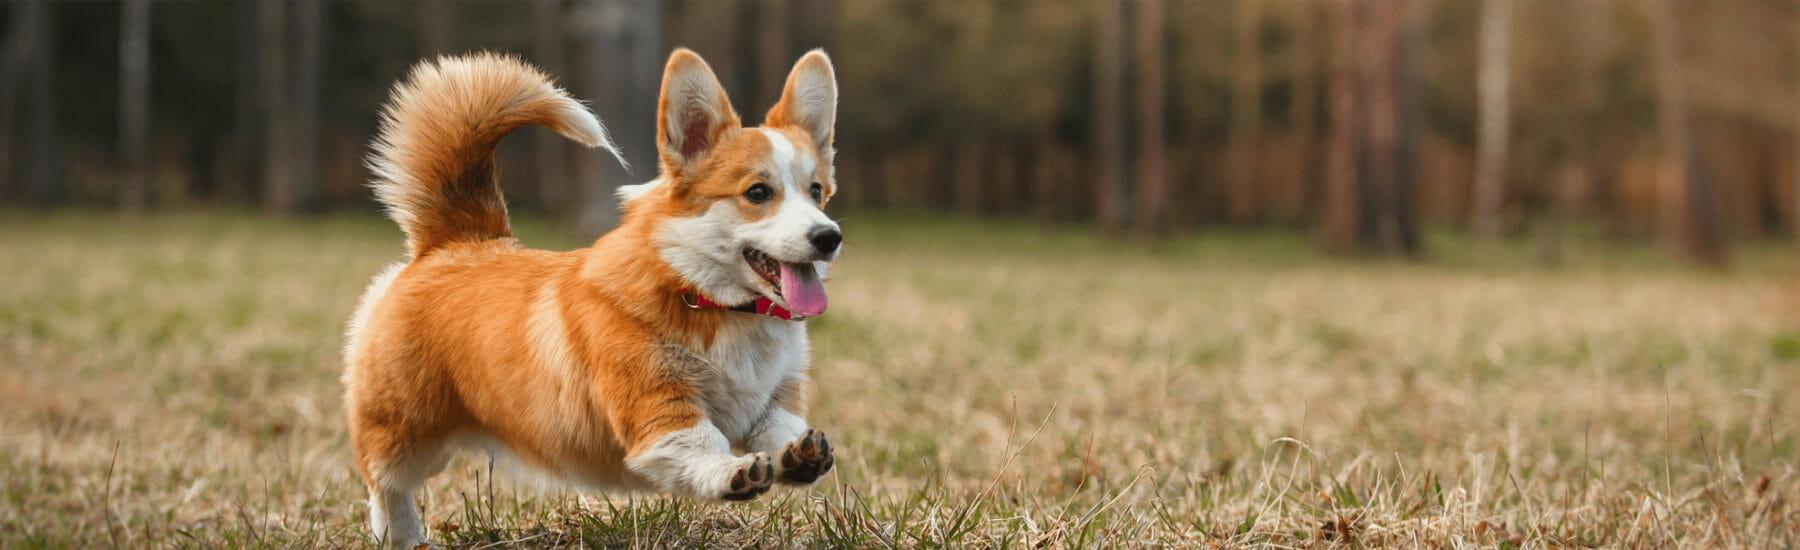 Orange dog jumping through the grass